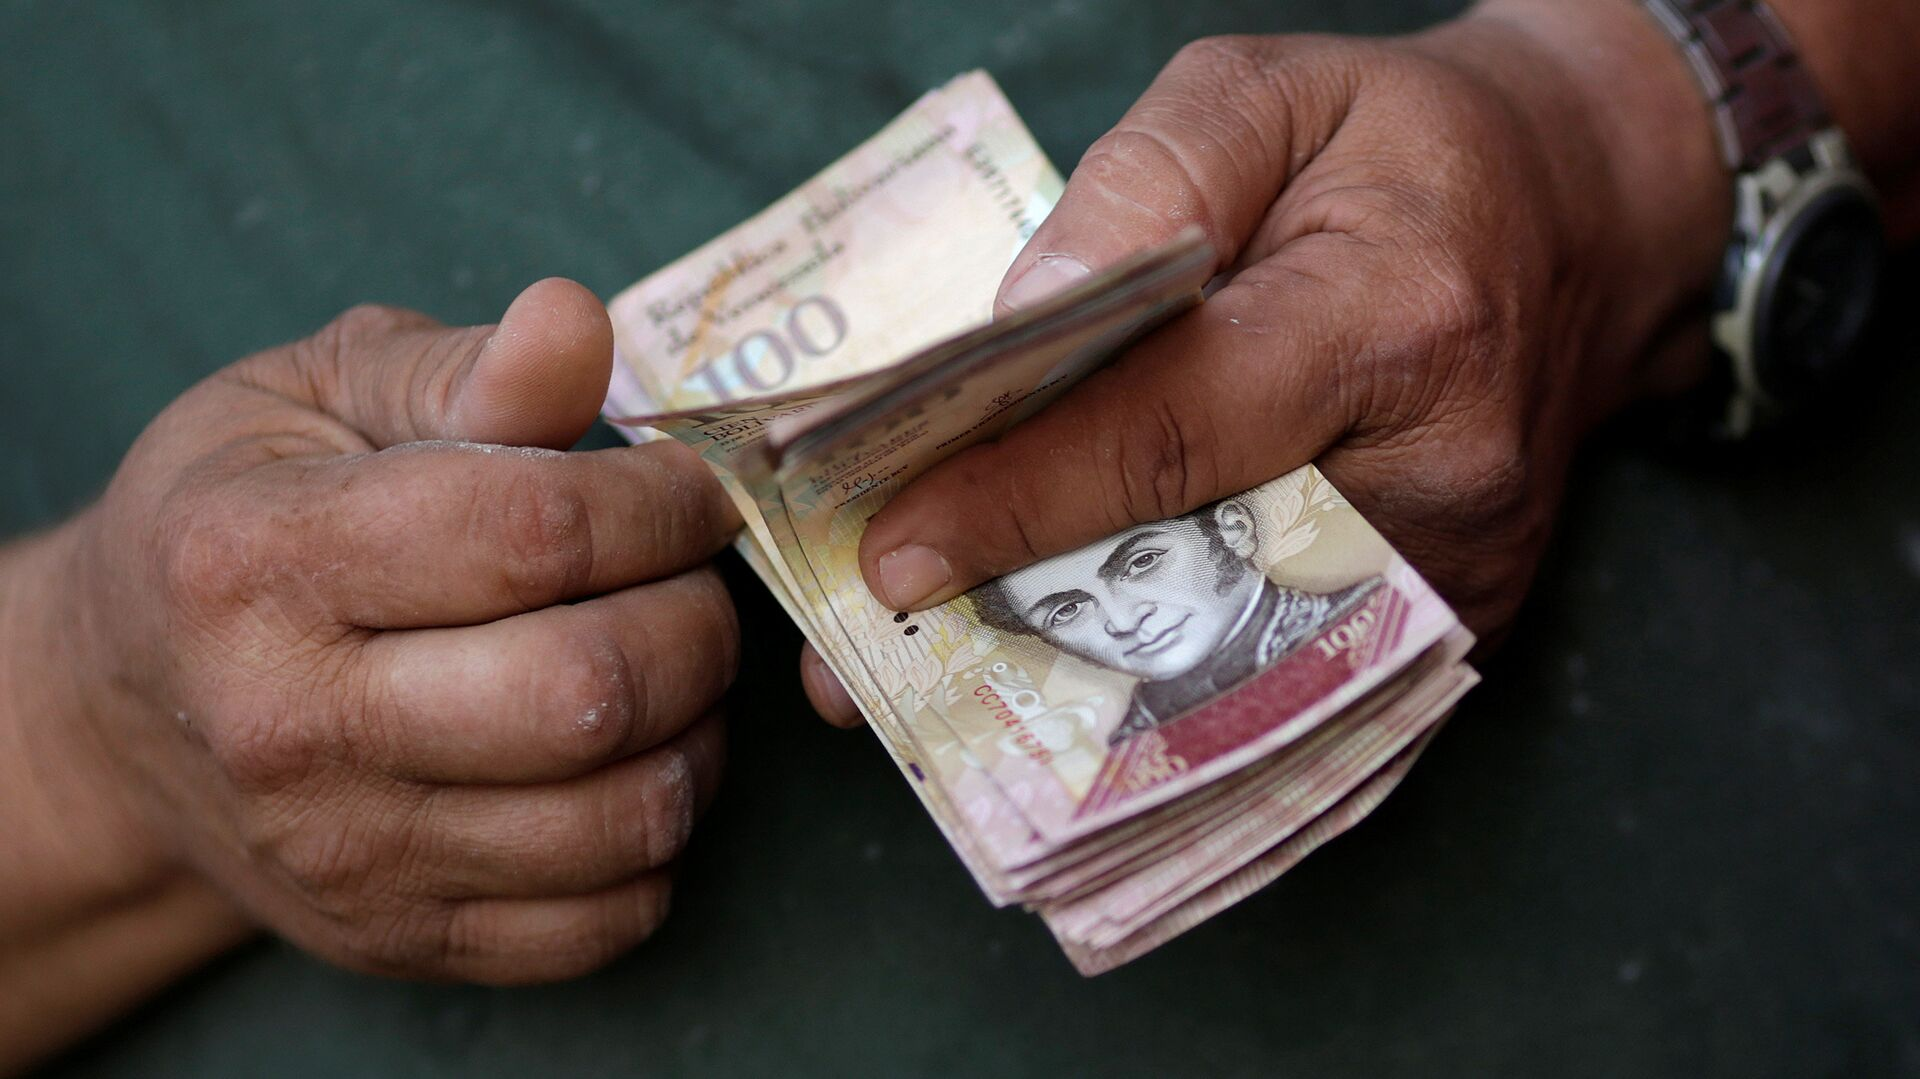 A cashier counts Venezuelan bolivar notes at a street market in downtown Caracas - Sputnik Mundo, 1920, 22.09.2021